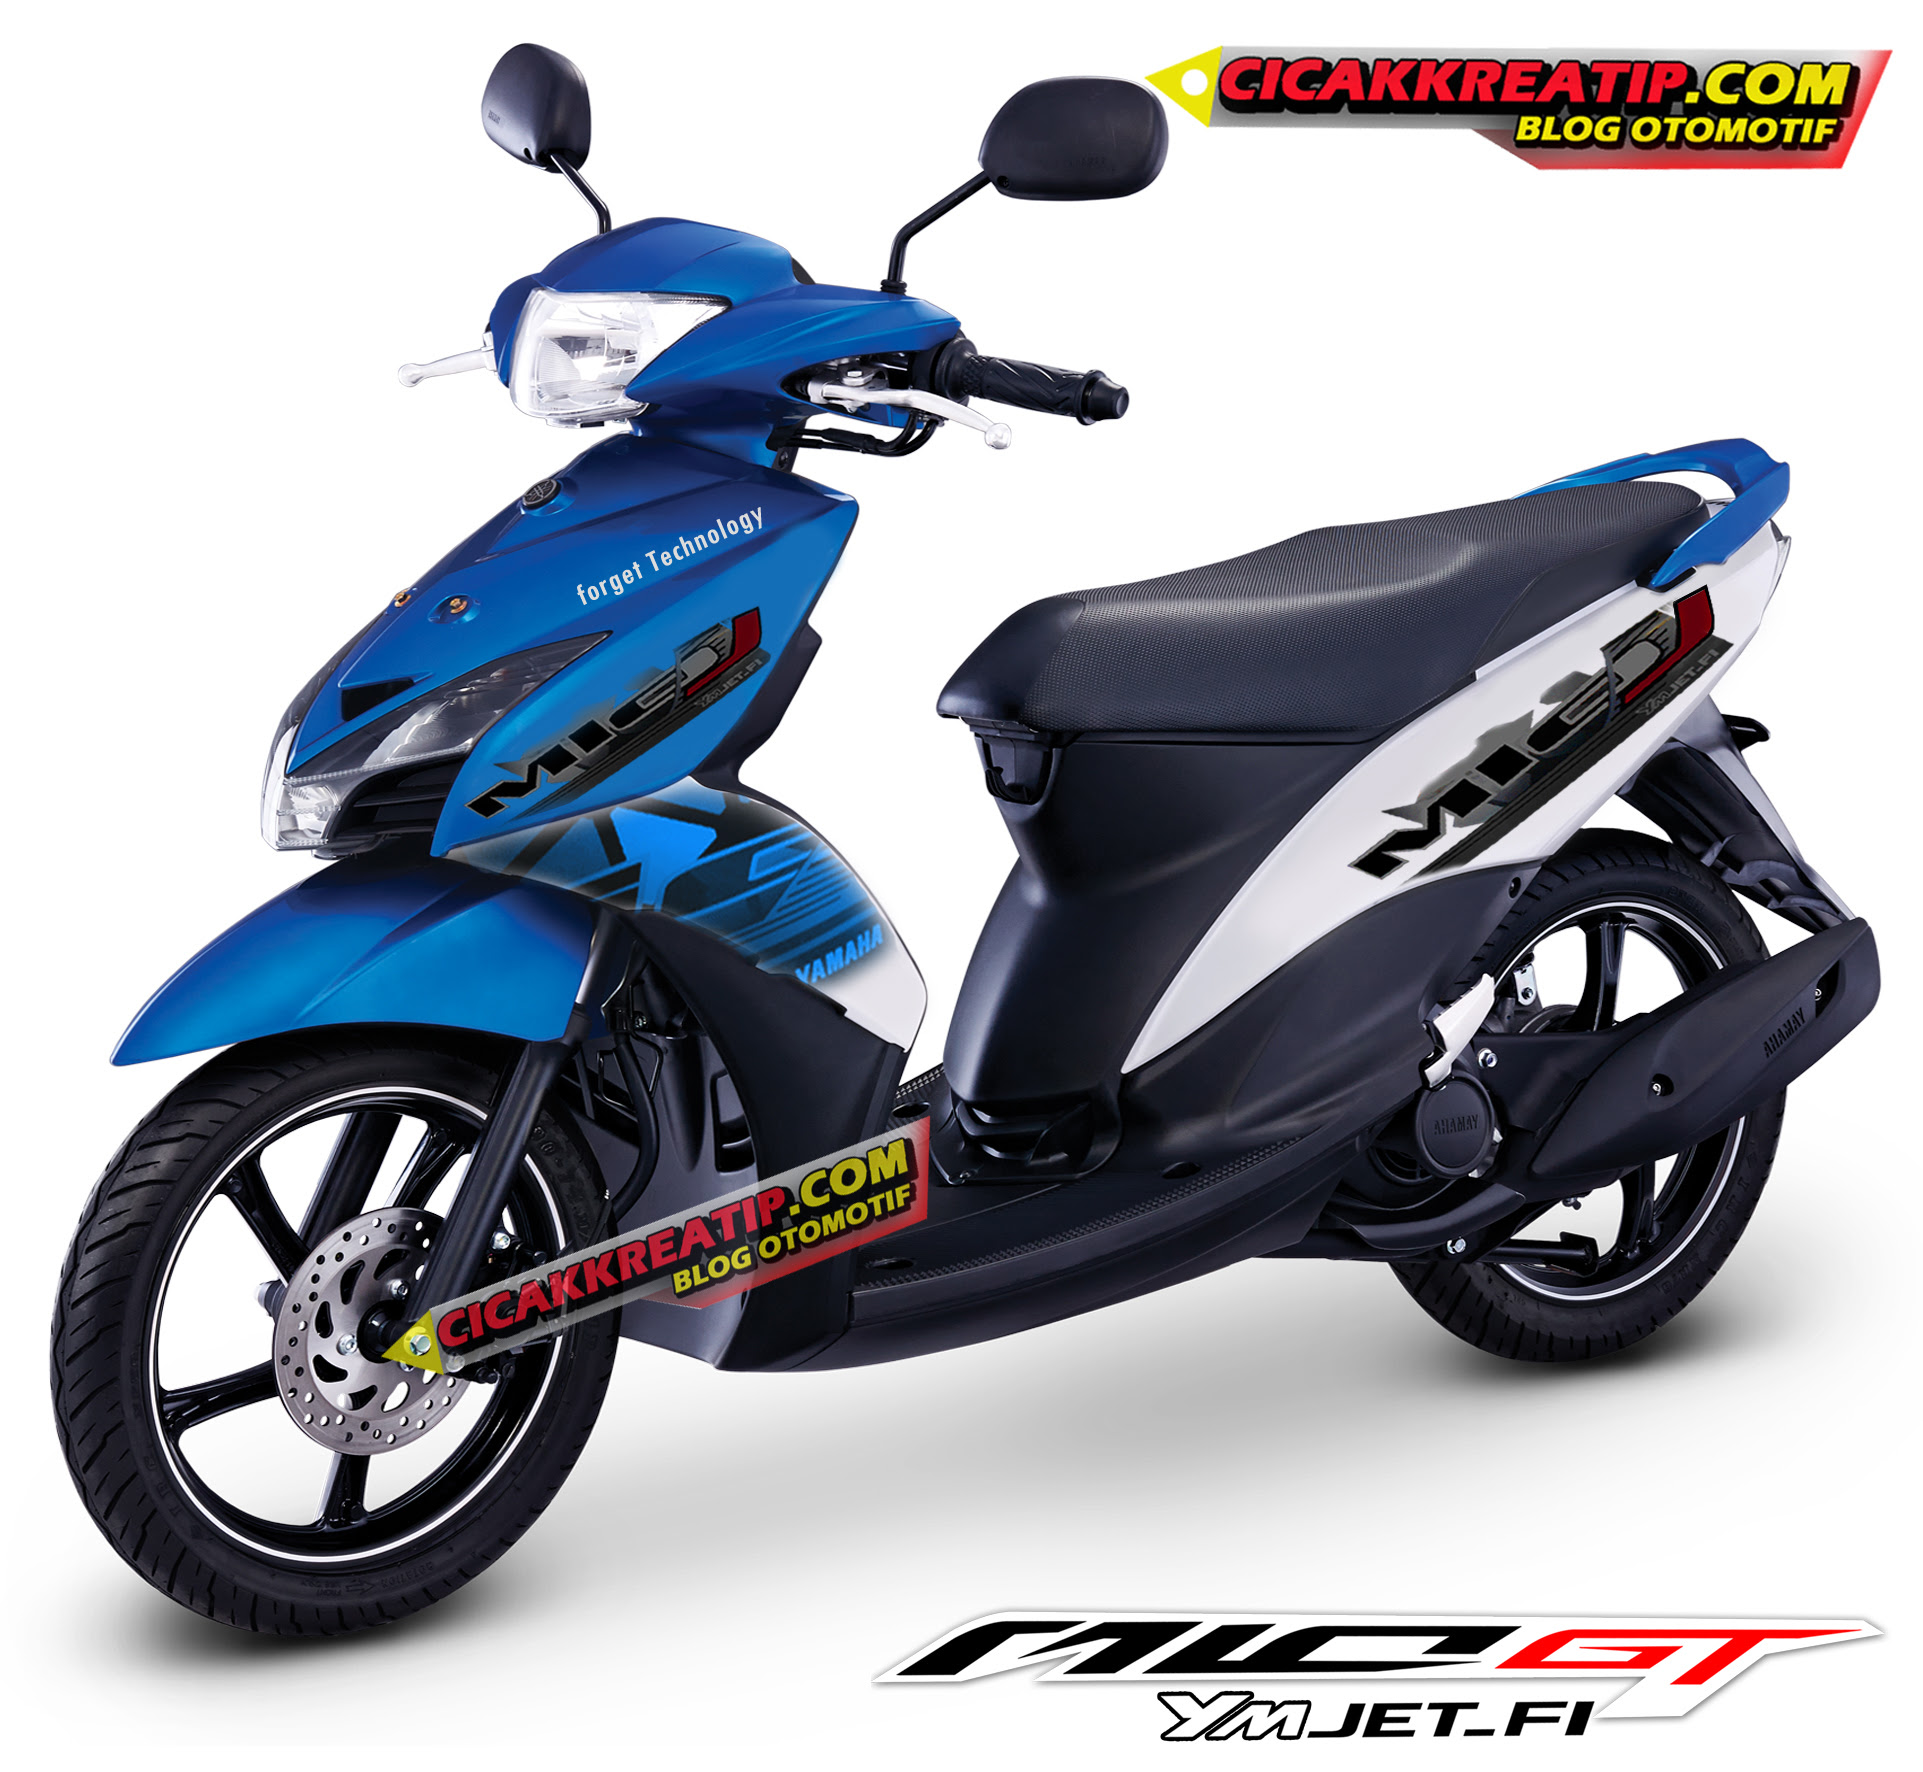 Download Koleksi 96 Modifikasi Motor Mio Gt Warna Biru Terupdate